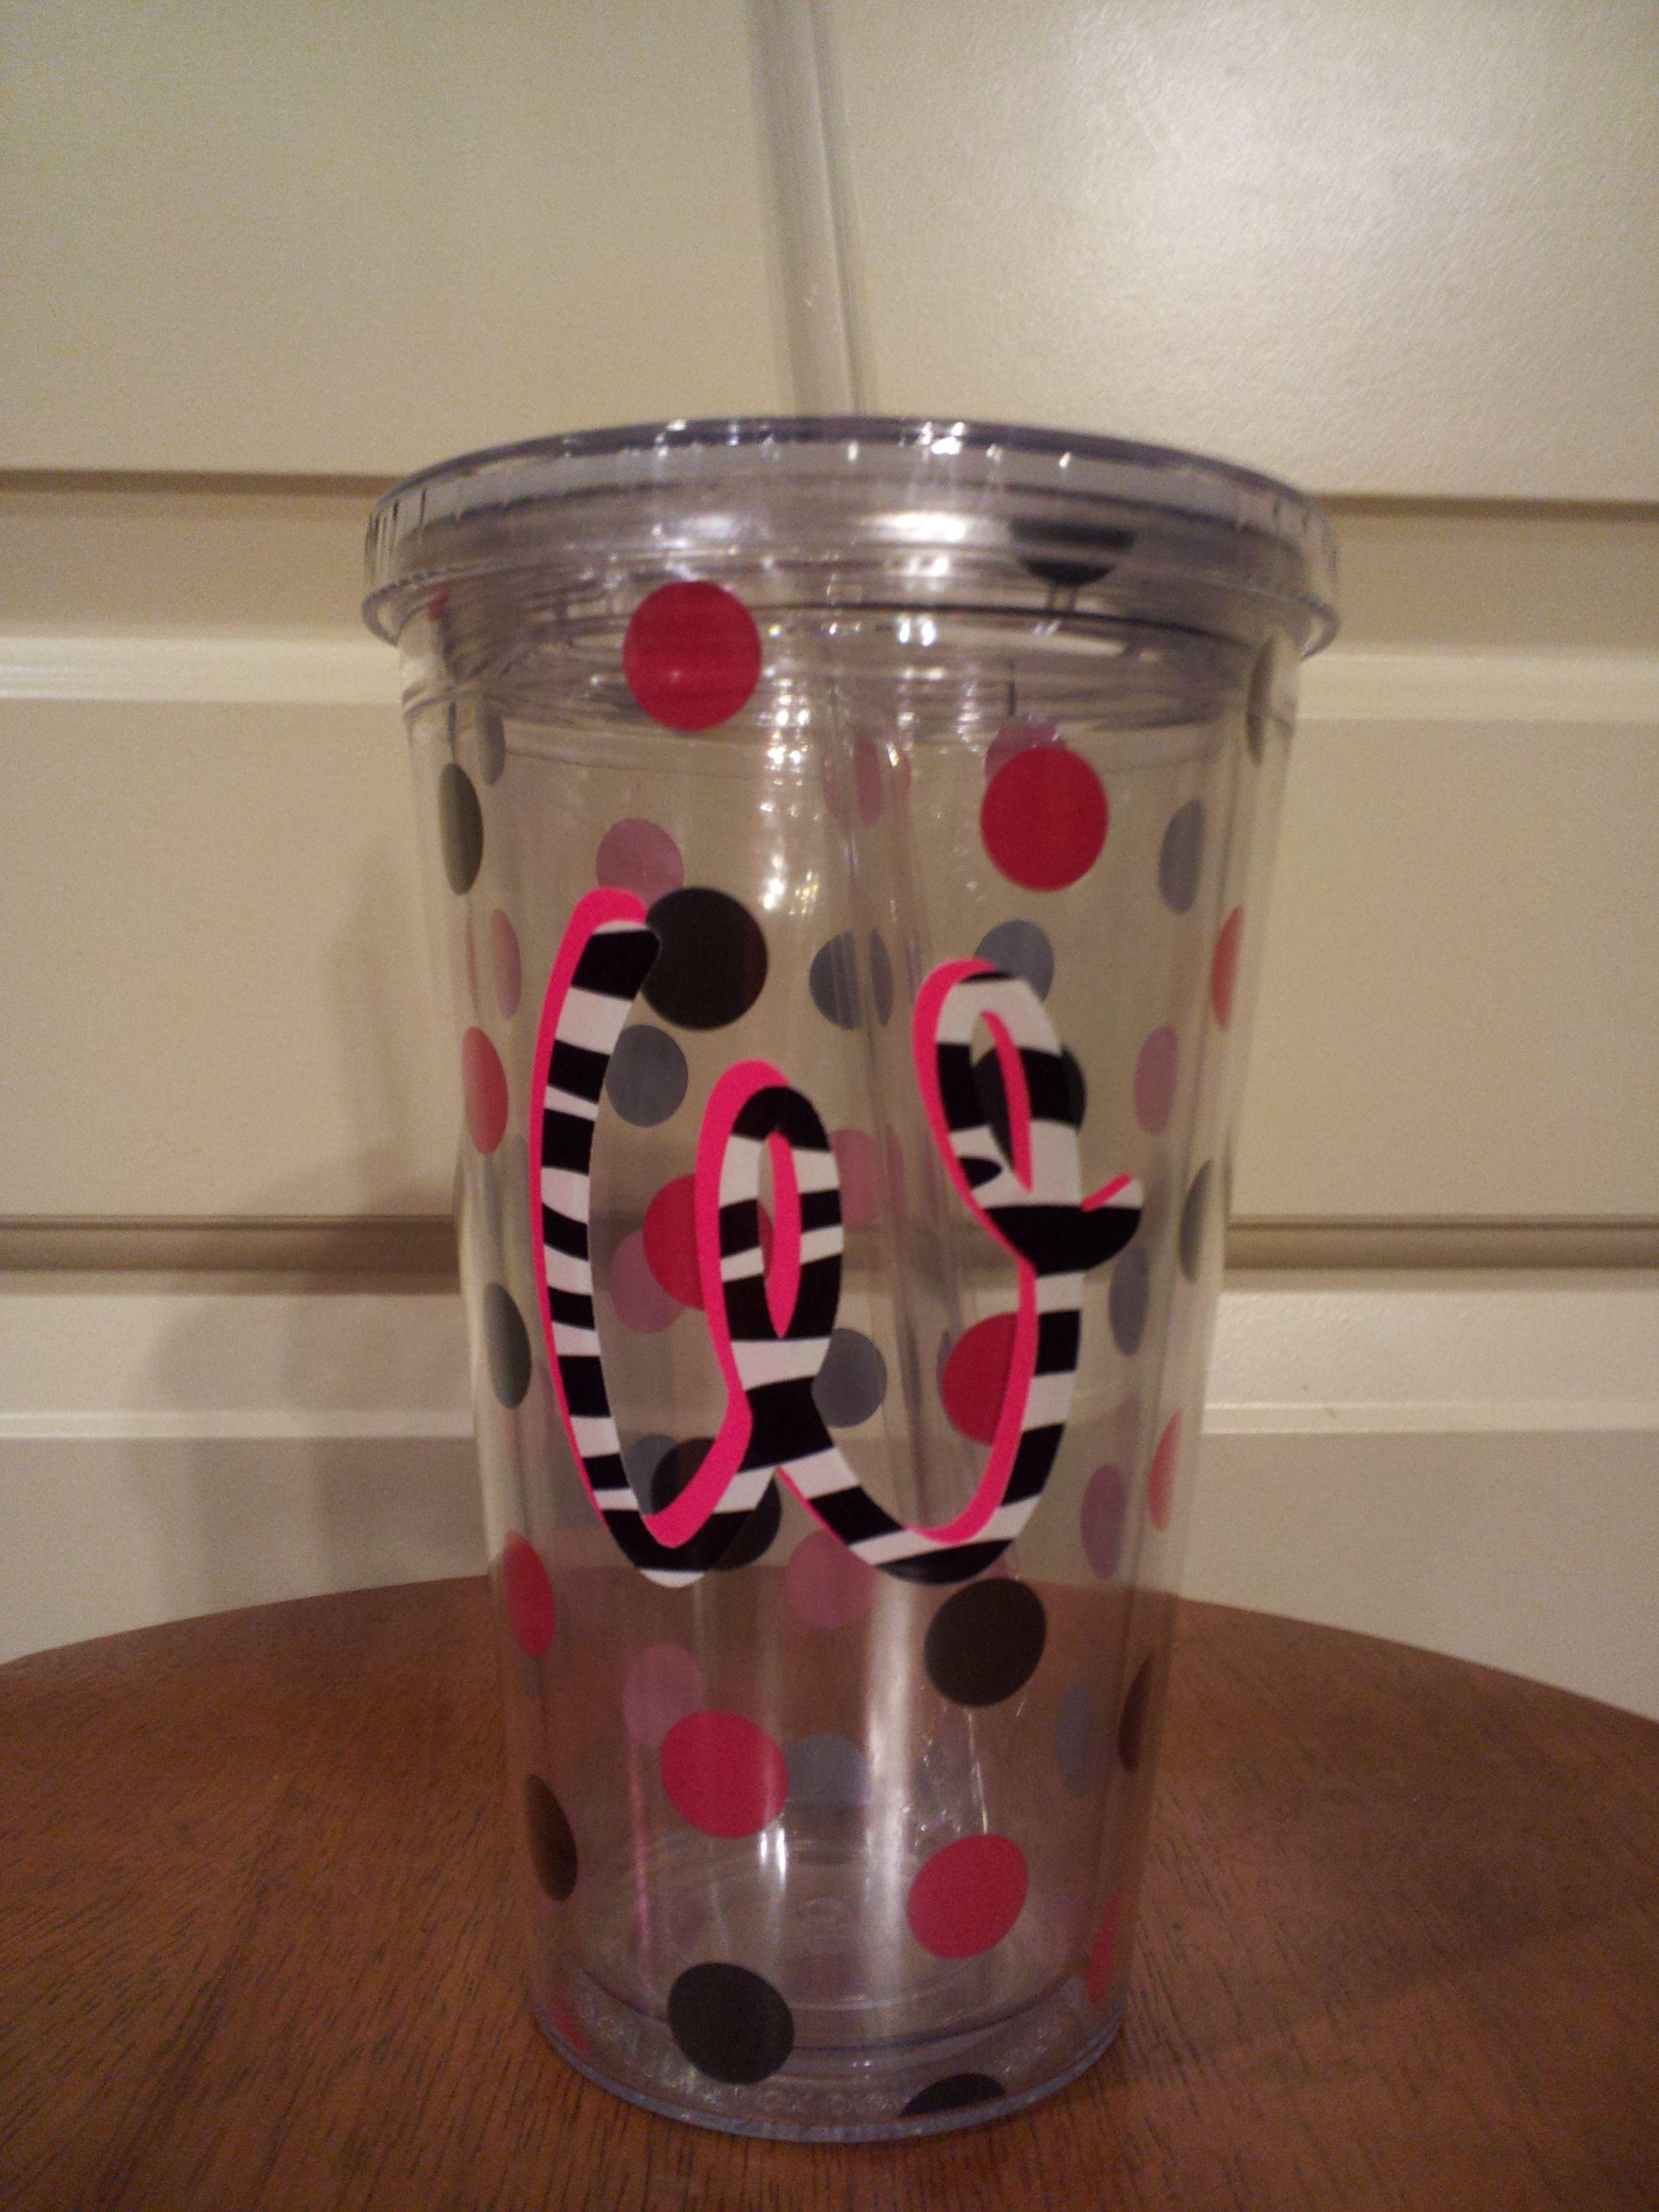 Personalized Cups Need Cricut Waterproof Vinyl